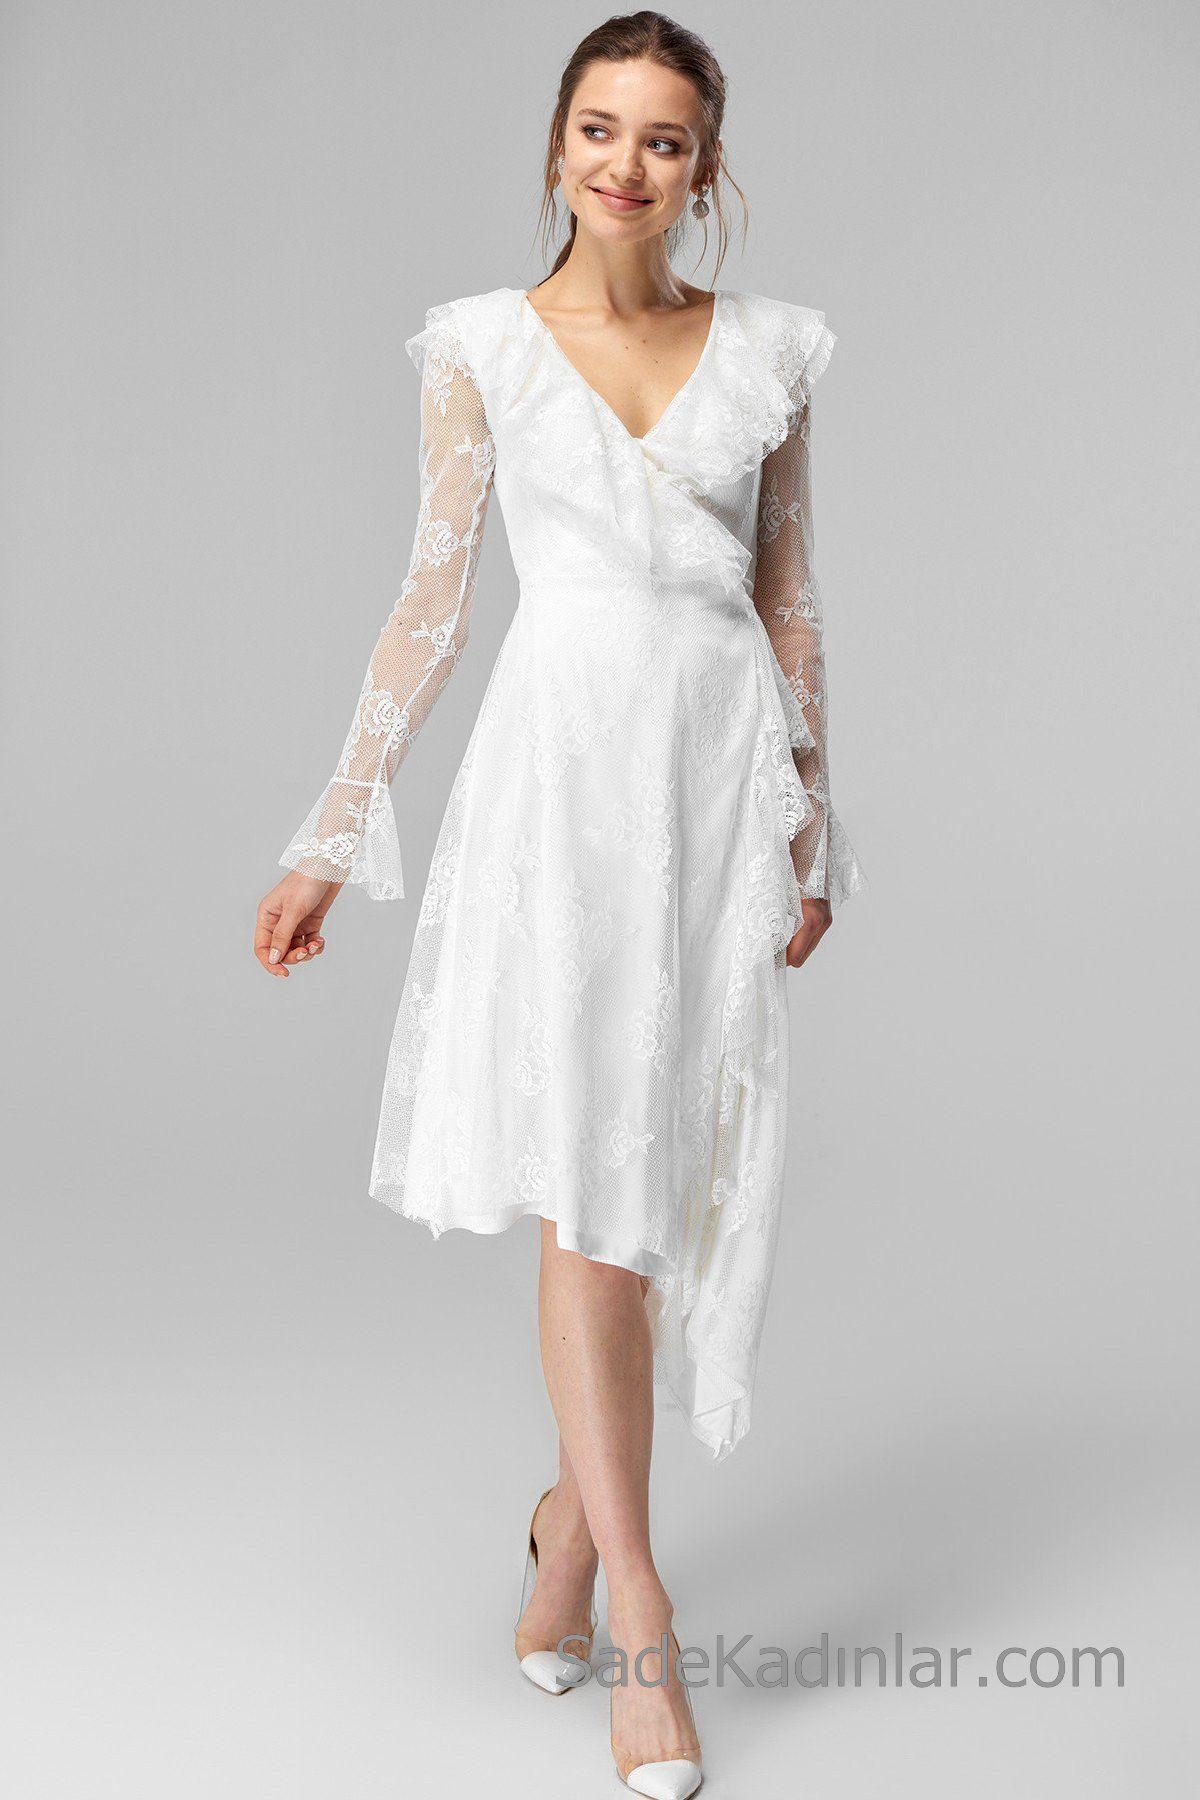 2020 Dantel Elbise Modelleri Beyaz Midi V Yakali Uzun Kol Elbise Modelleri Dantel Elbise Elbise